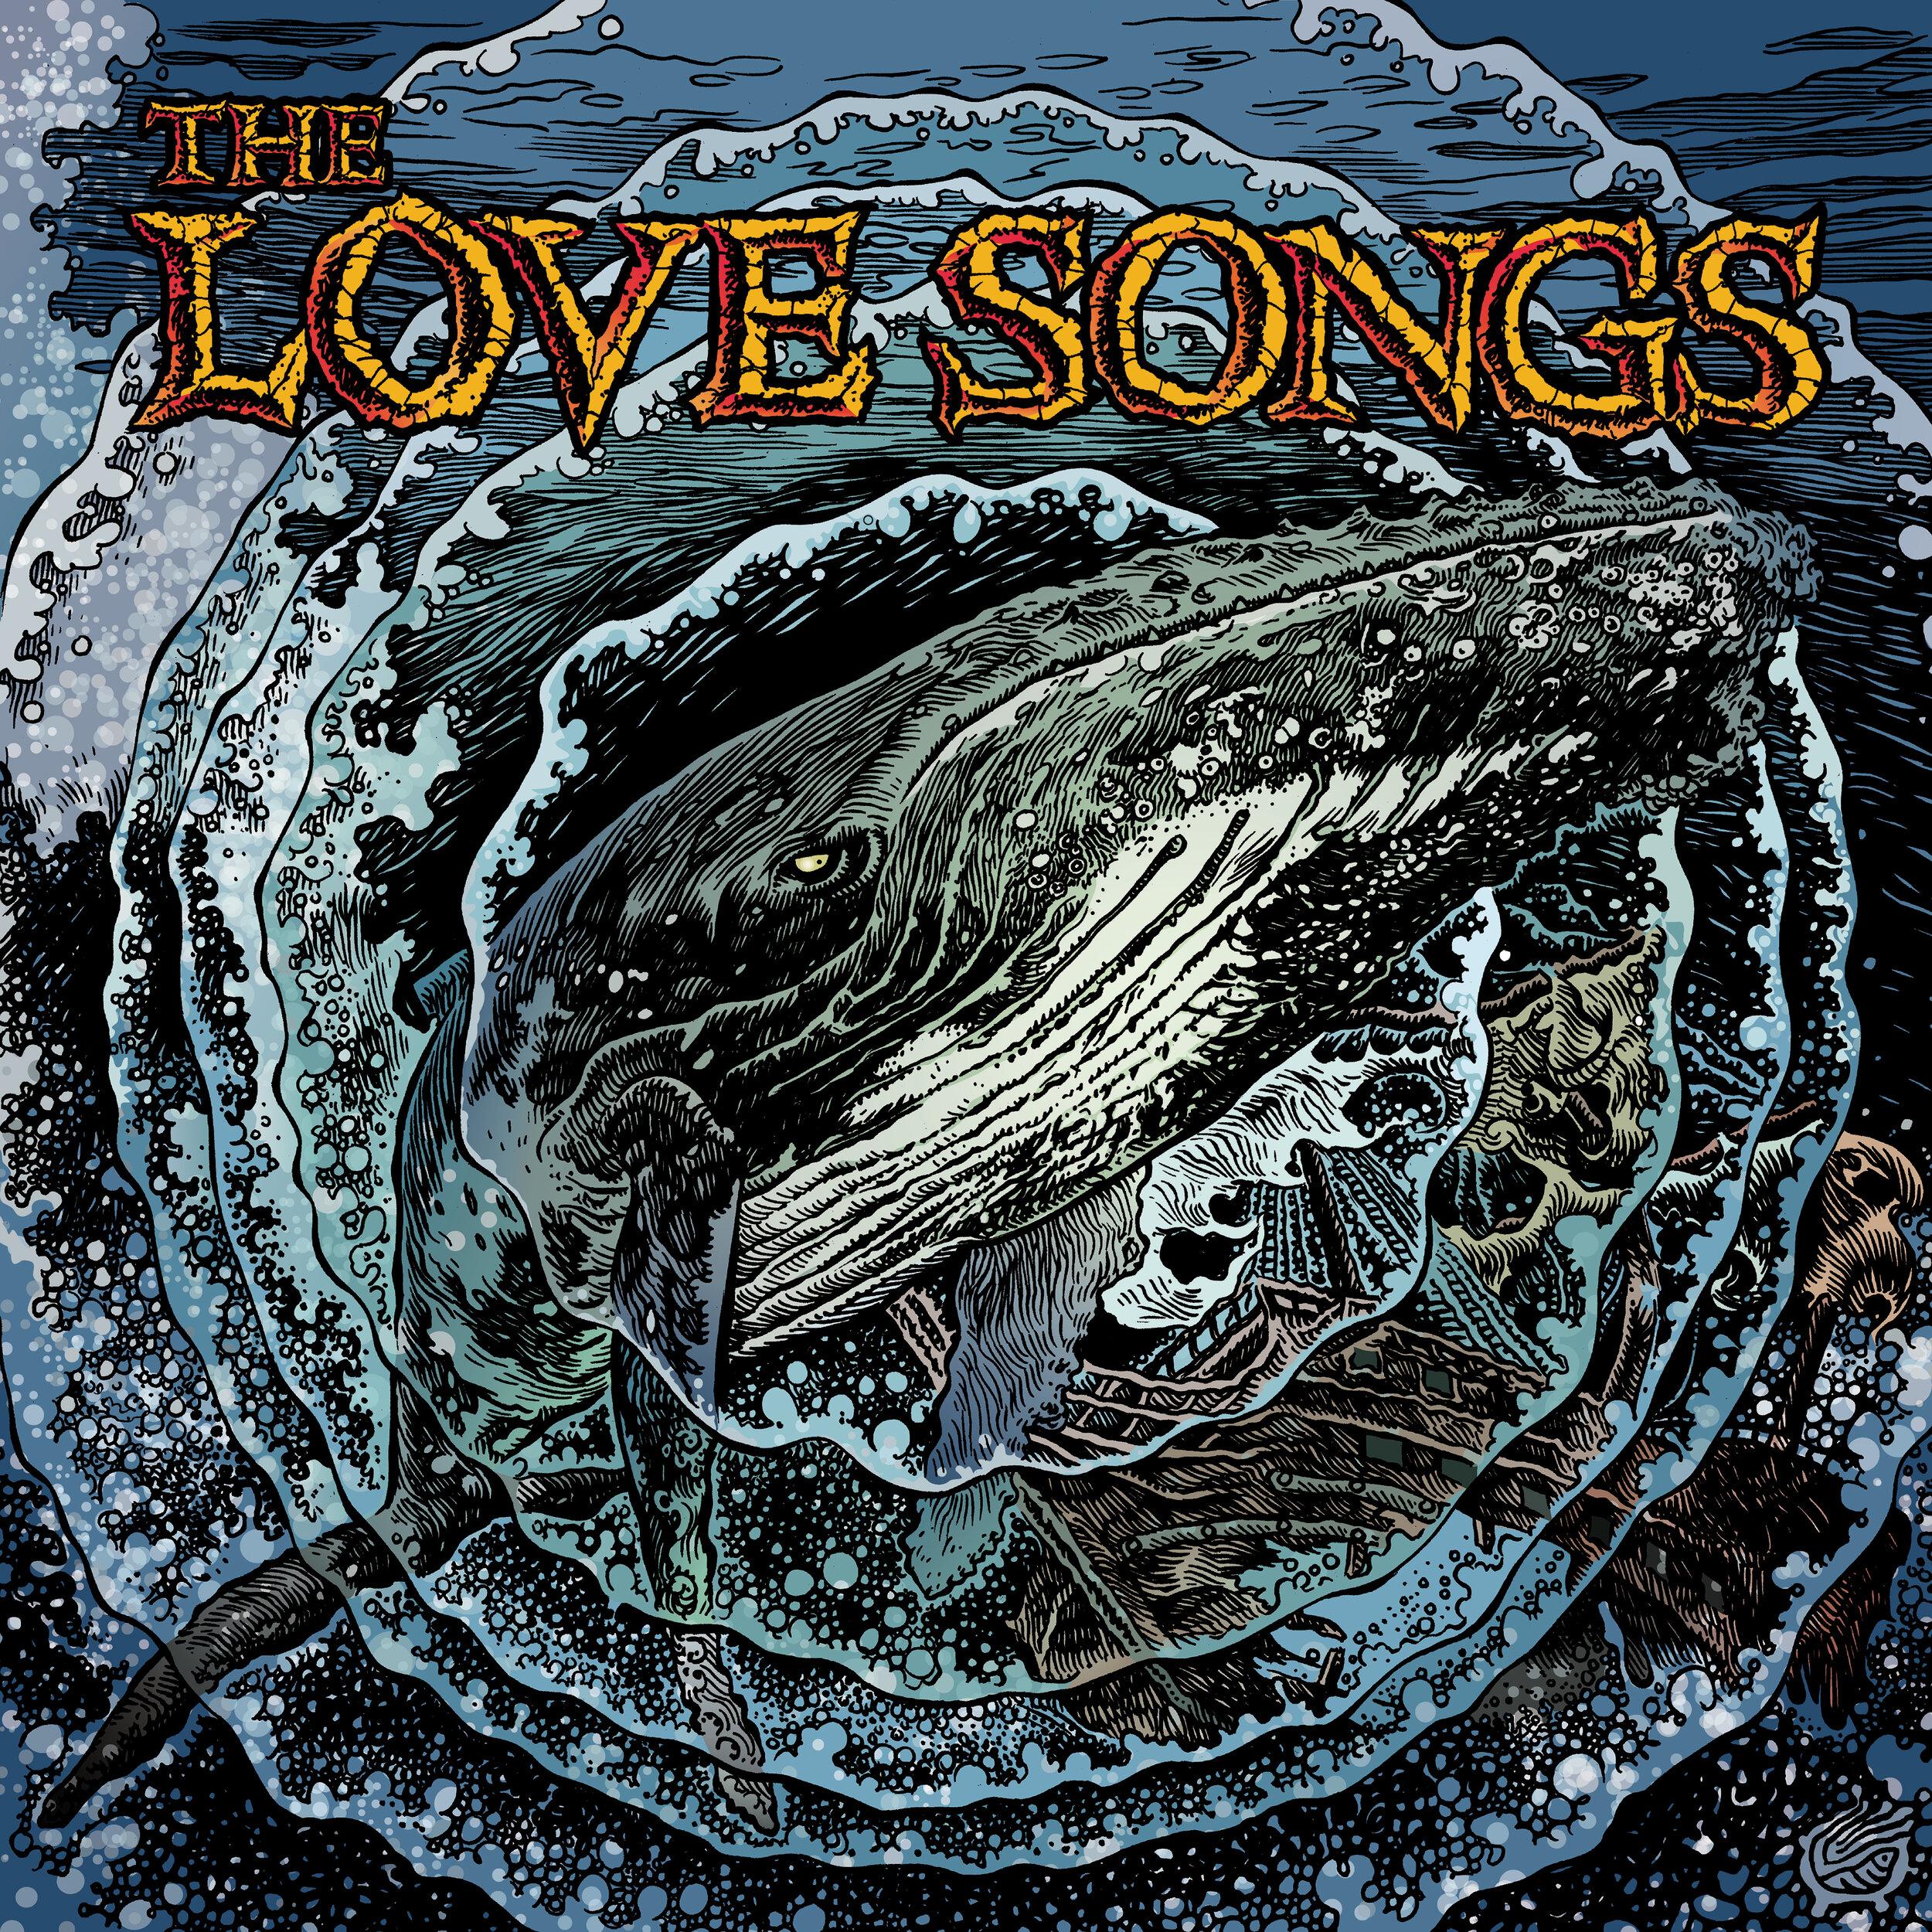 BM019 - The Love Songs - The Loneliest Whale [2019] Digital Artwork.jpg